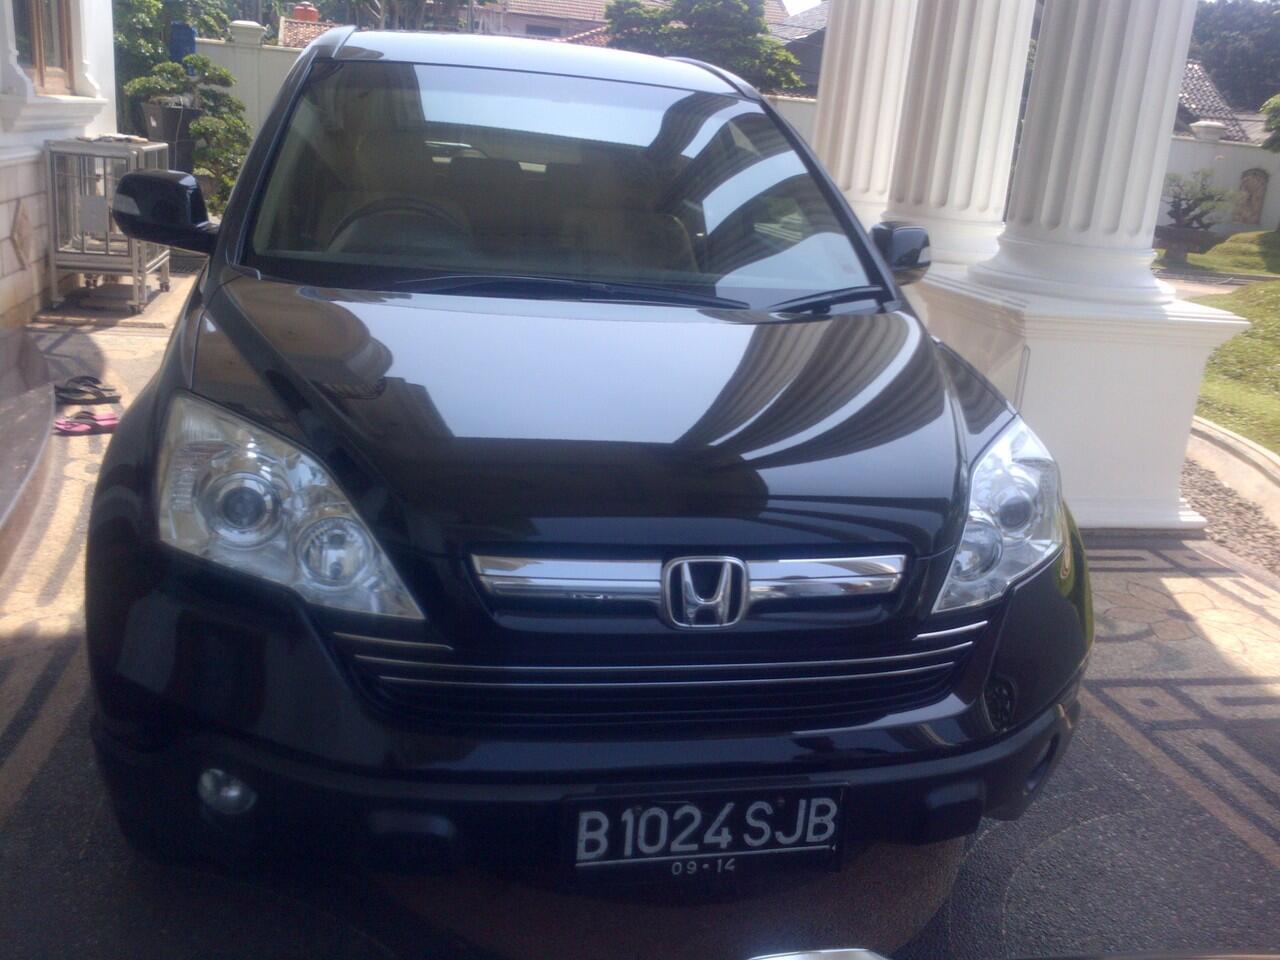 Honda All New CRV 2.4 A/T 2009 BLACK Mulusss Jual Cepat